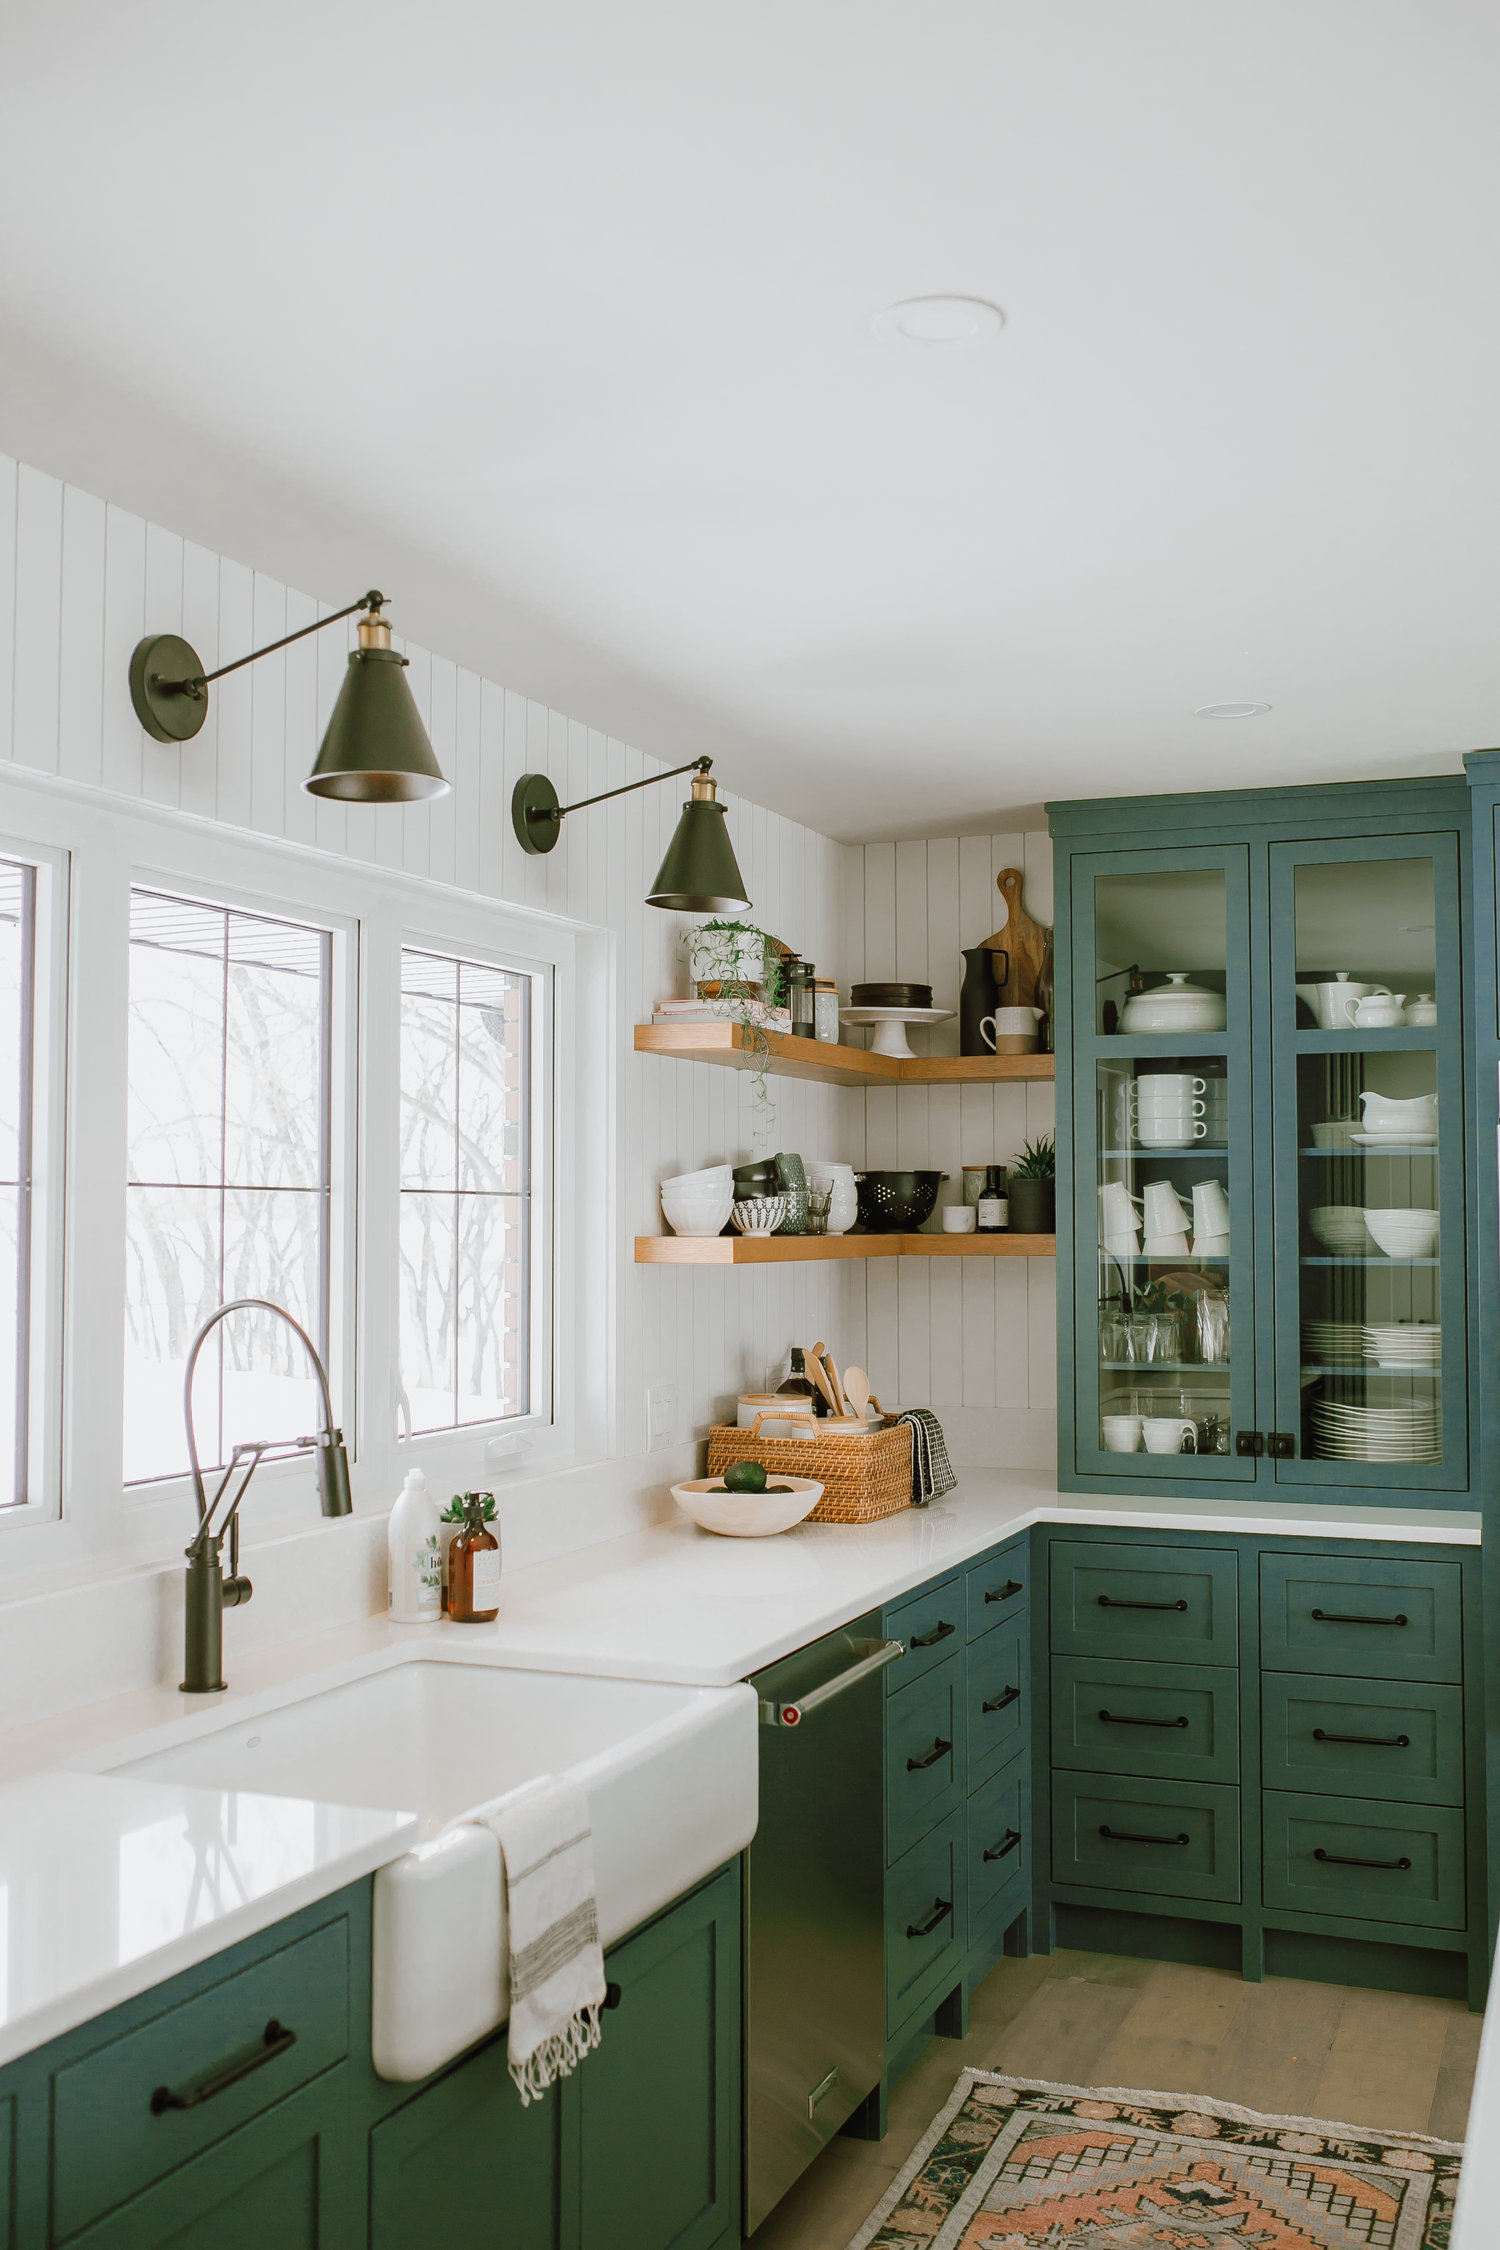 jade-green-cabinets